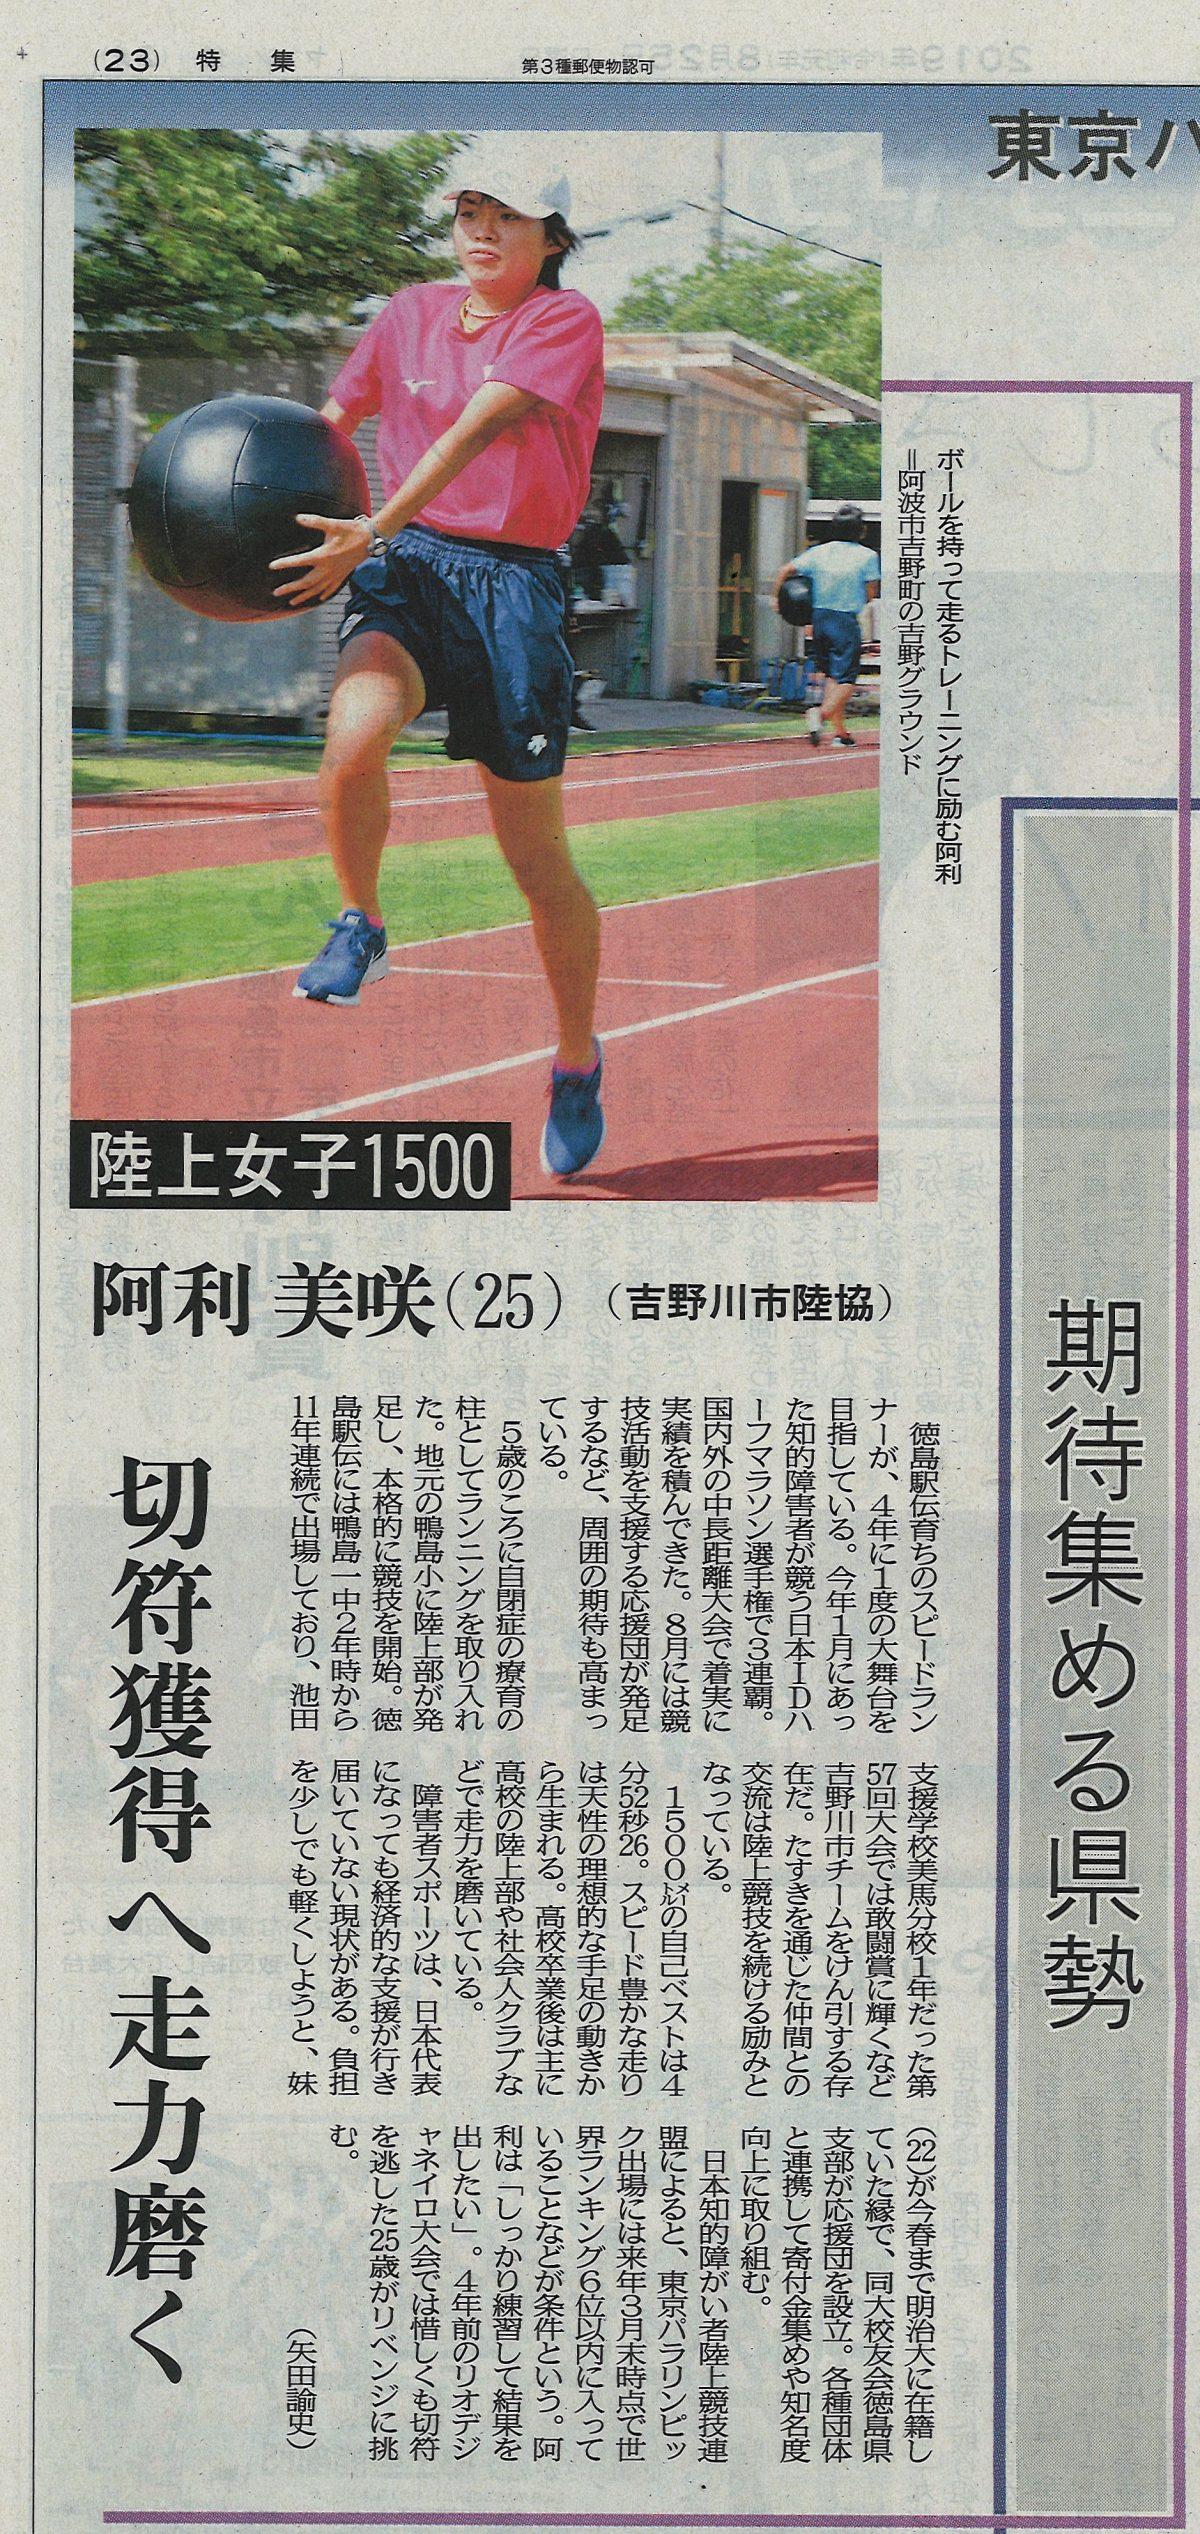 KITAKIKAIは阿利美咲選手を応援しています